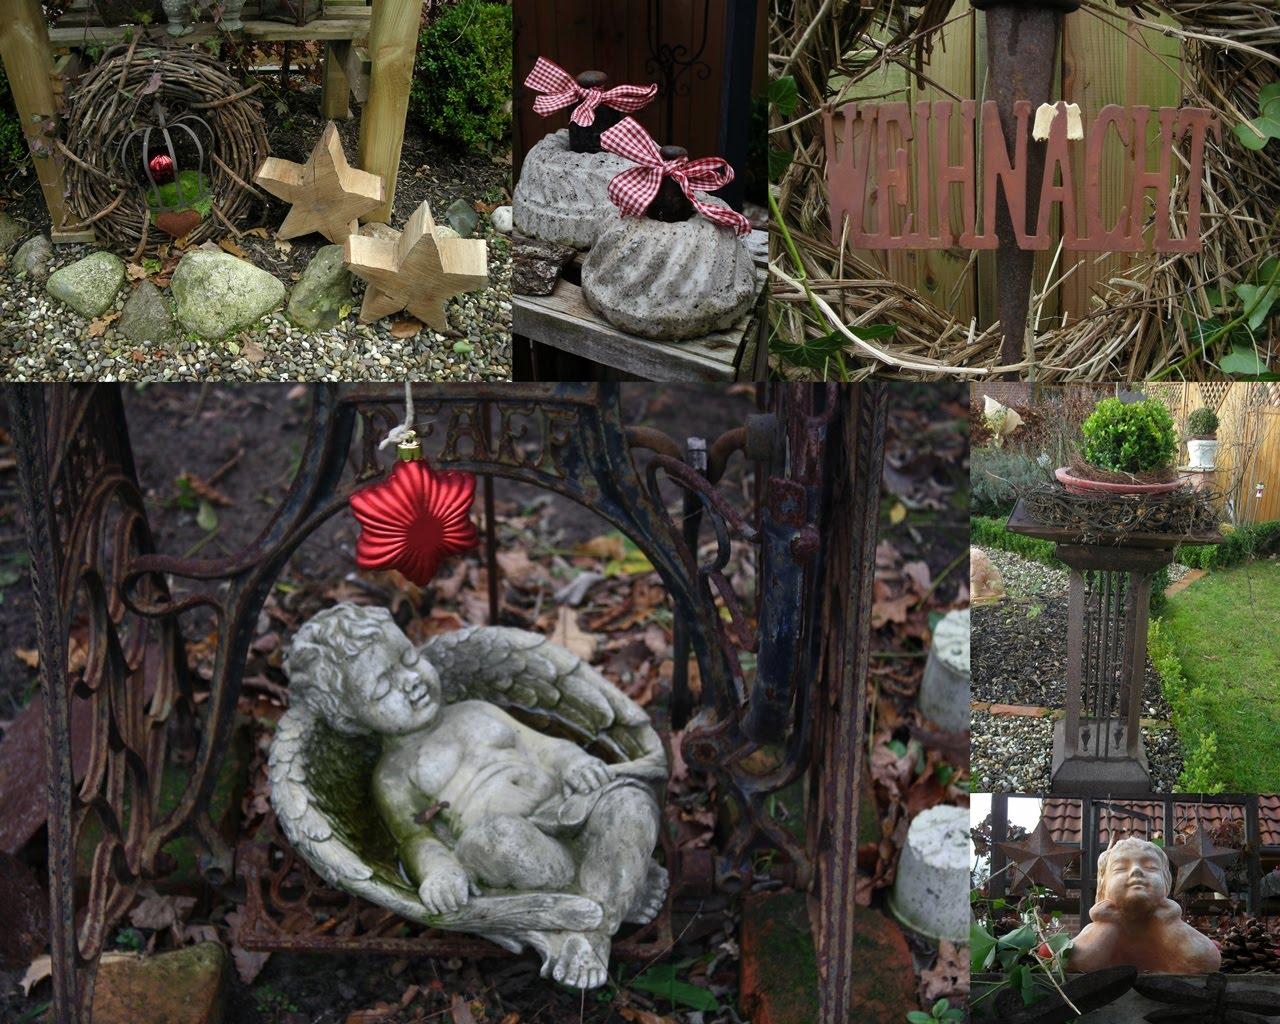 frisian garden feedage 14928308. Black Bedroom Furniture Sets. Home Design Ideas